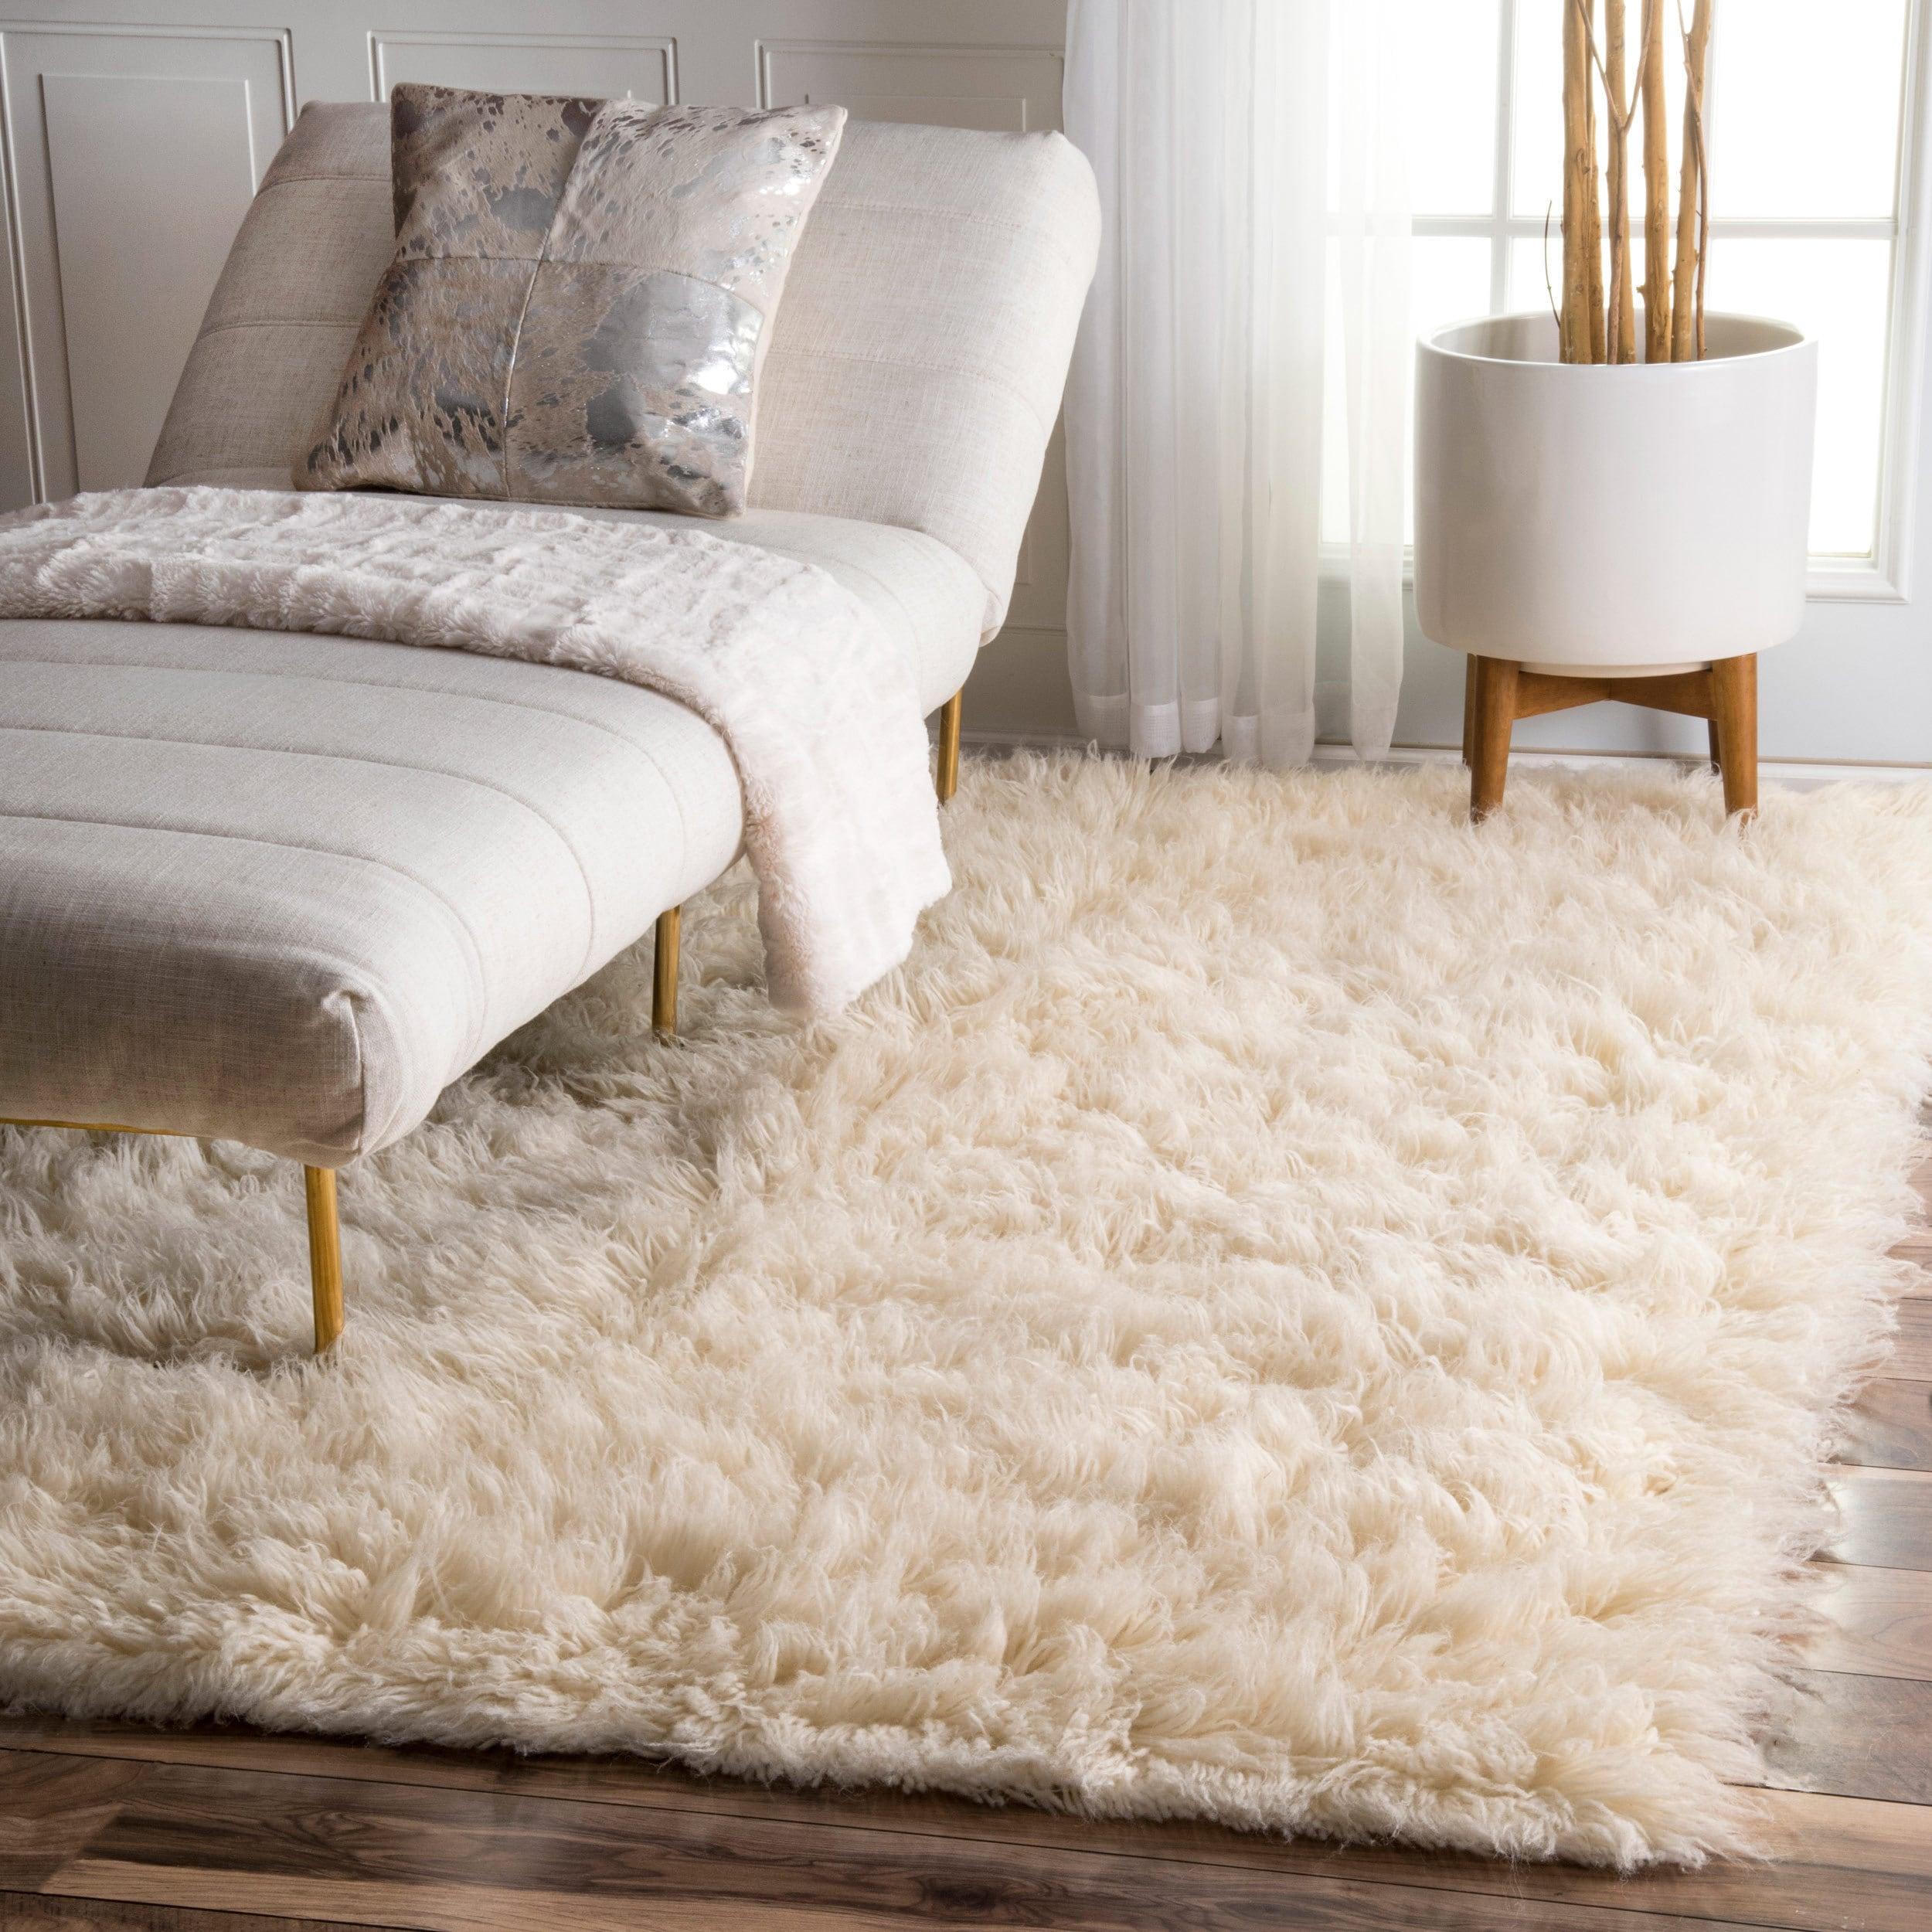 nuloom hand-woven flokati wool shag rug (5u0027 x 7u0027) - free shipping today INQBFCW